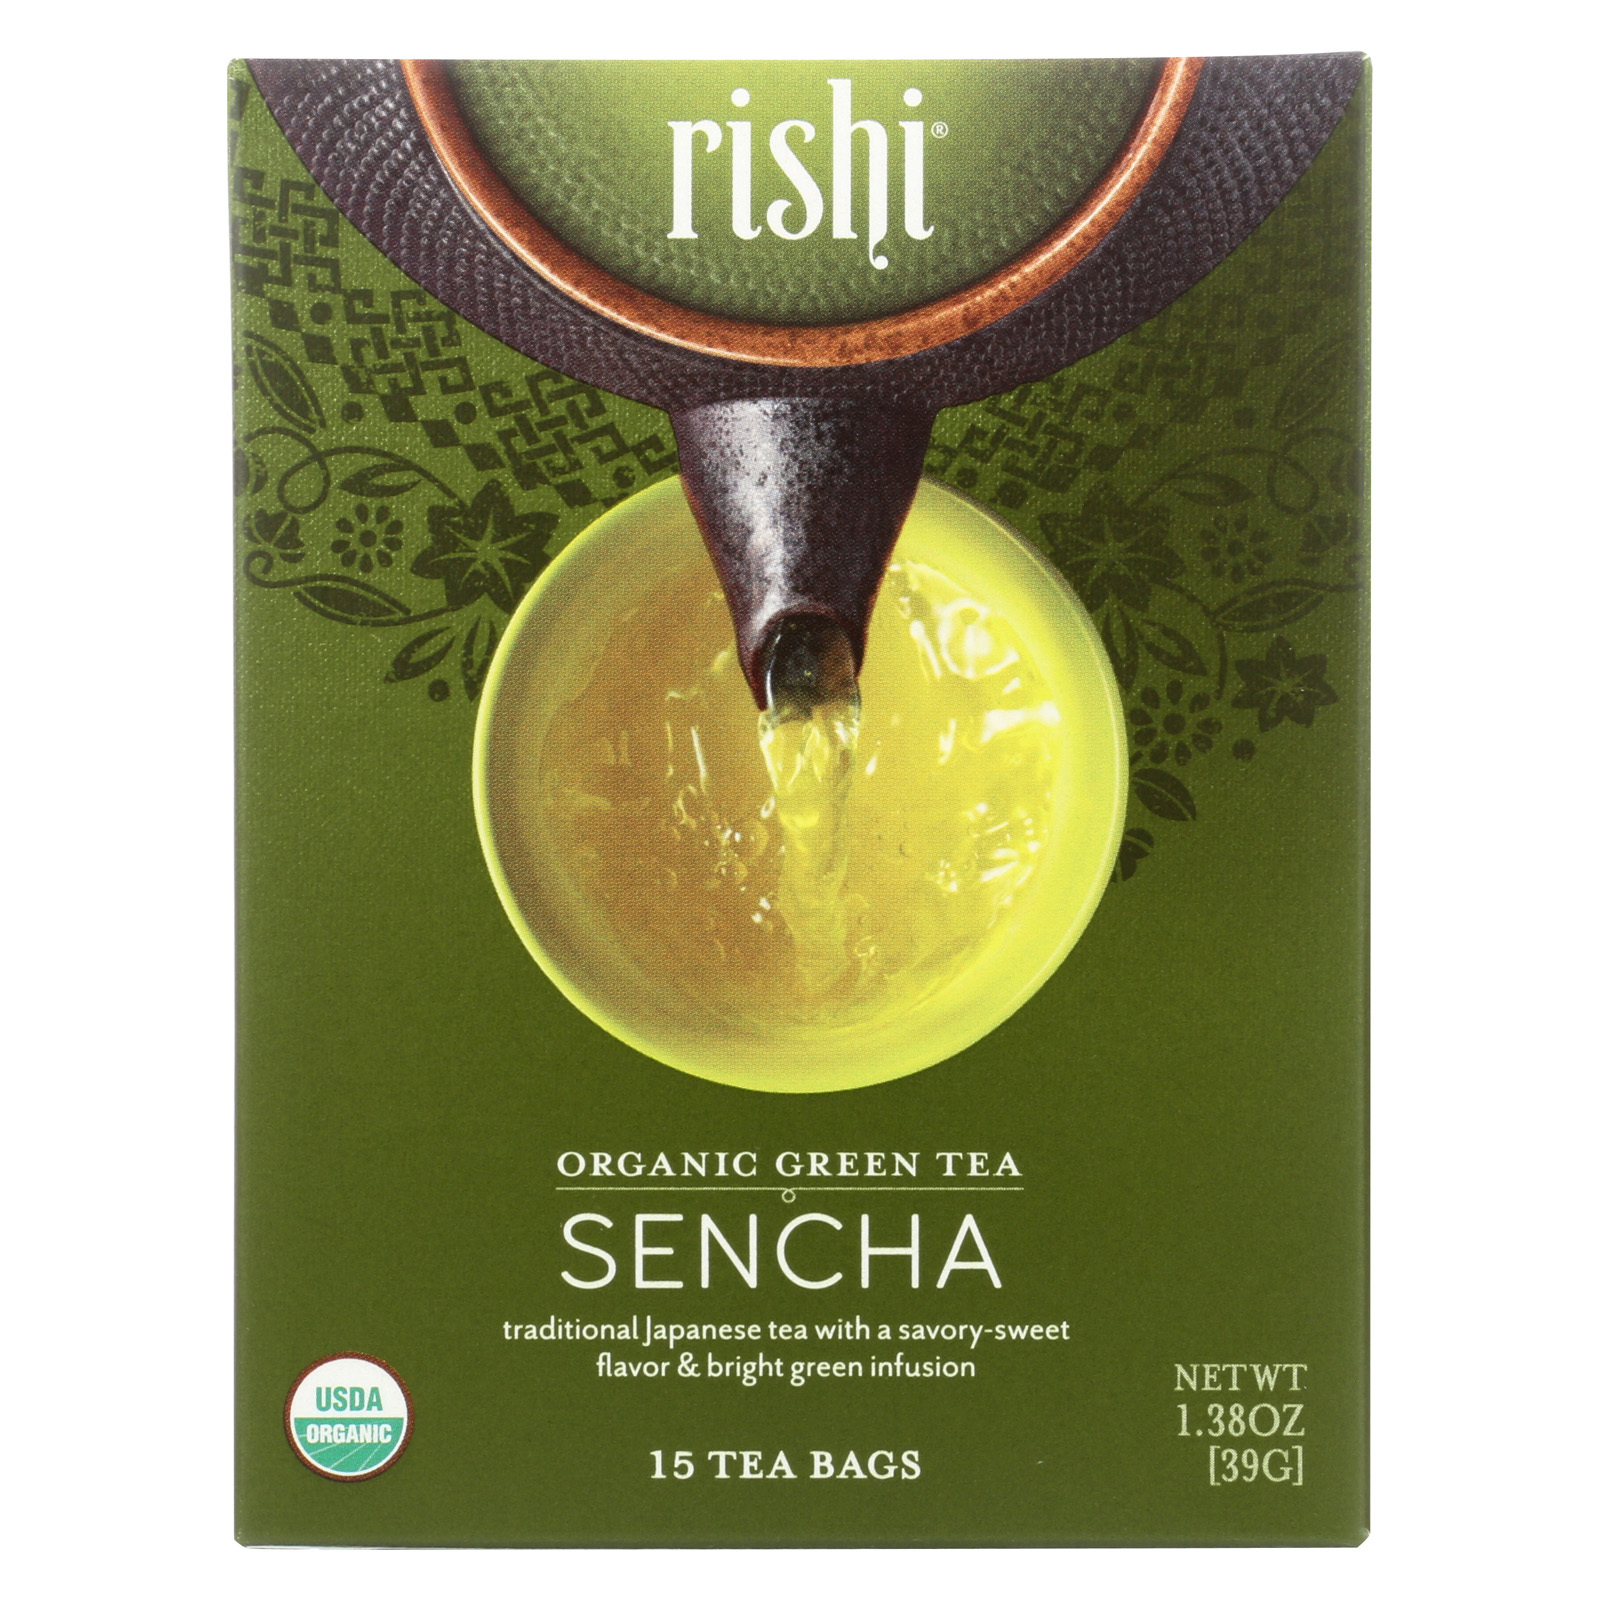 Rishi Organic Green Tea - Sencha - Case of 6 - 15 Bags